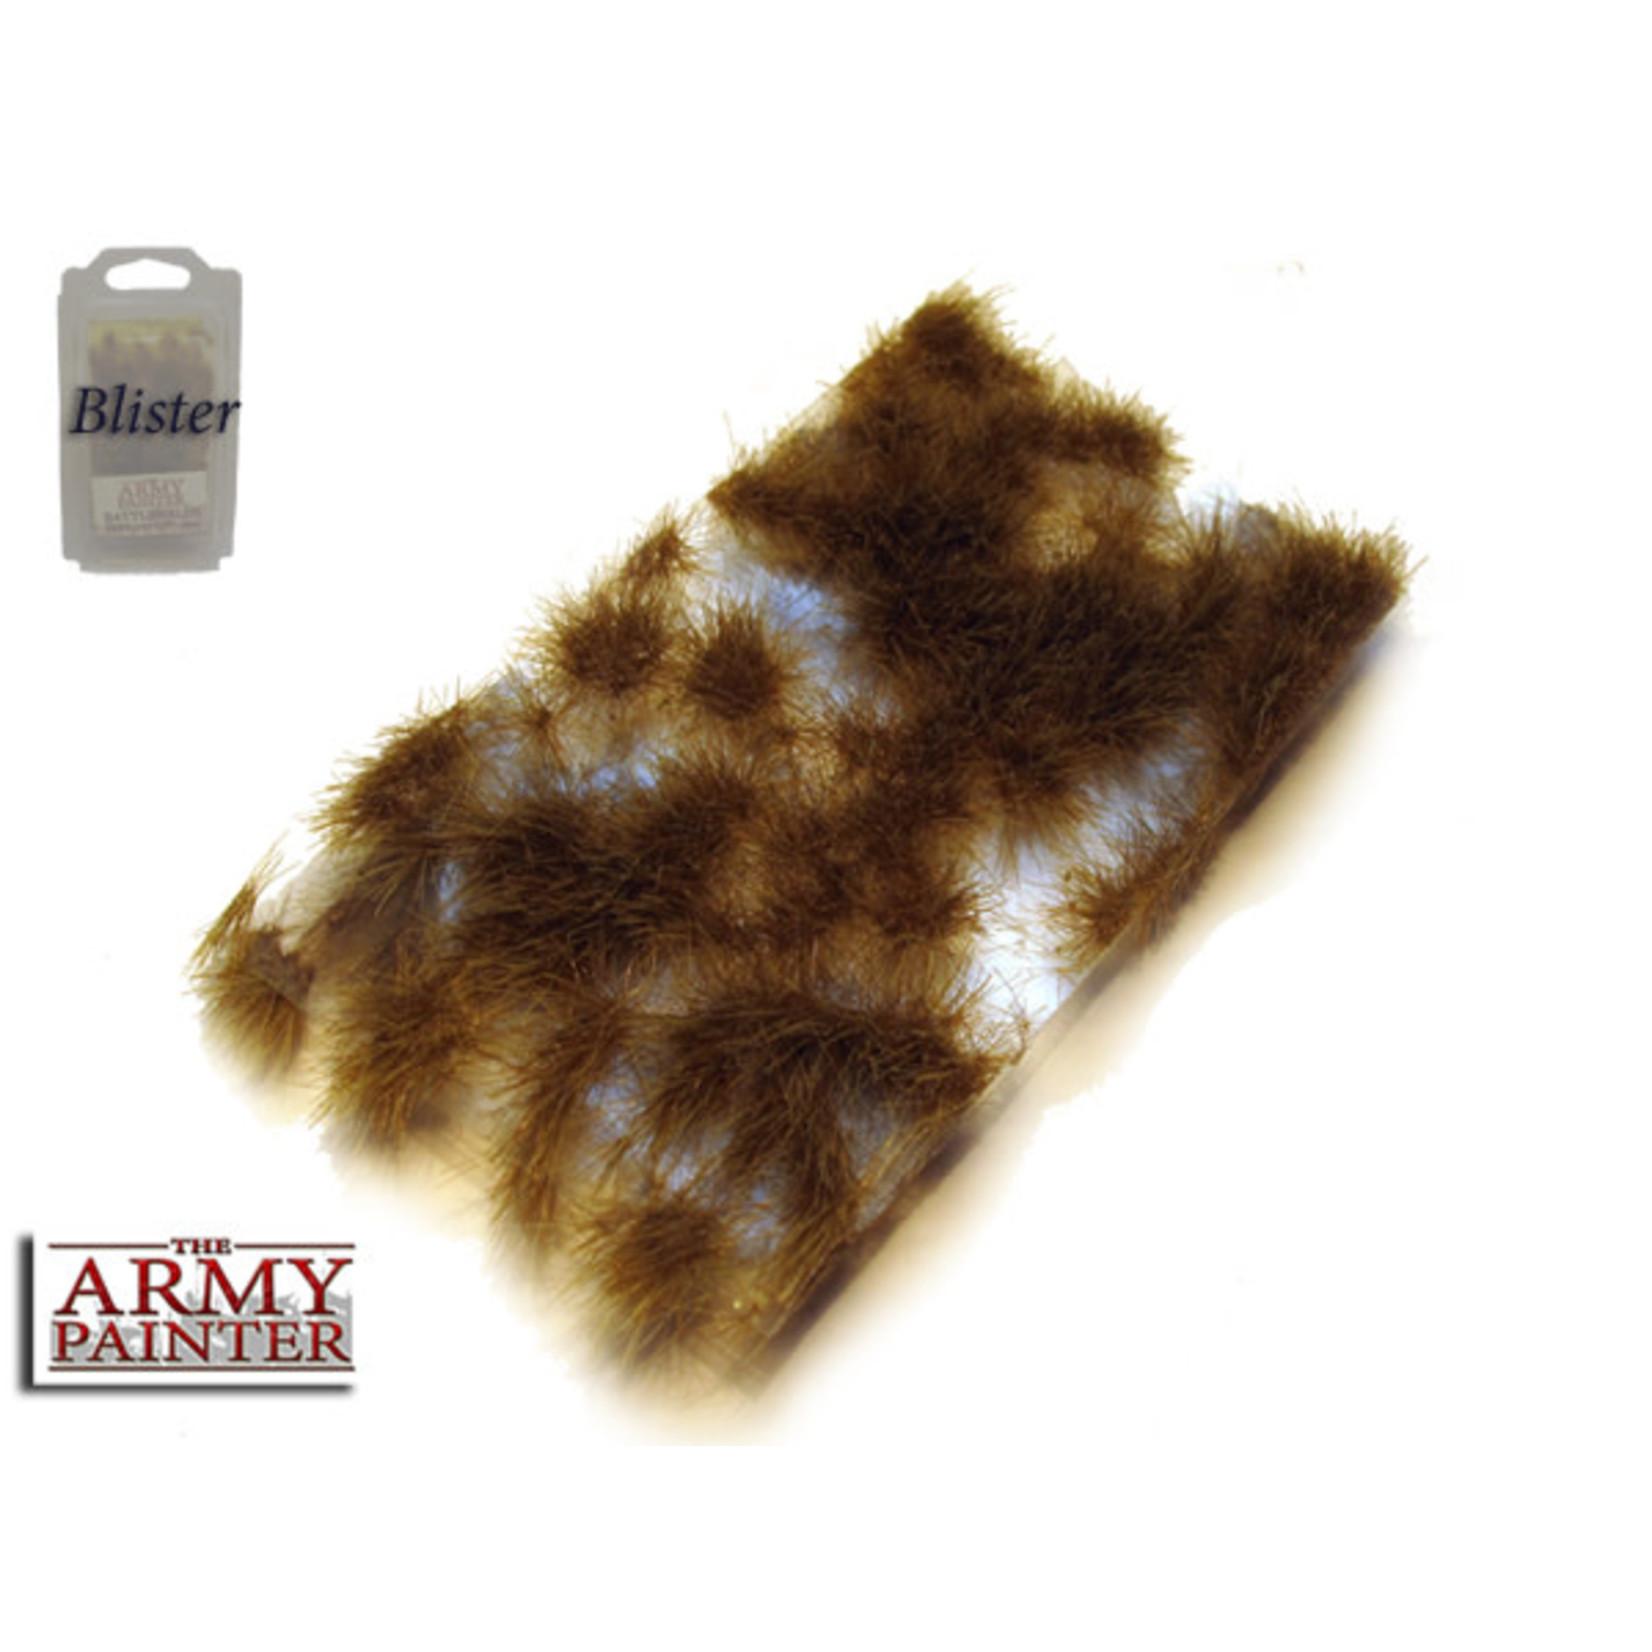 Army Painter Battlefields XP Highland Tuft